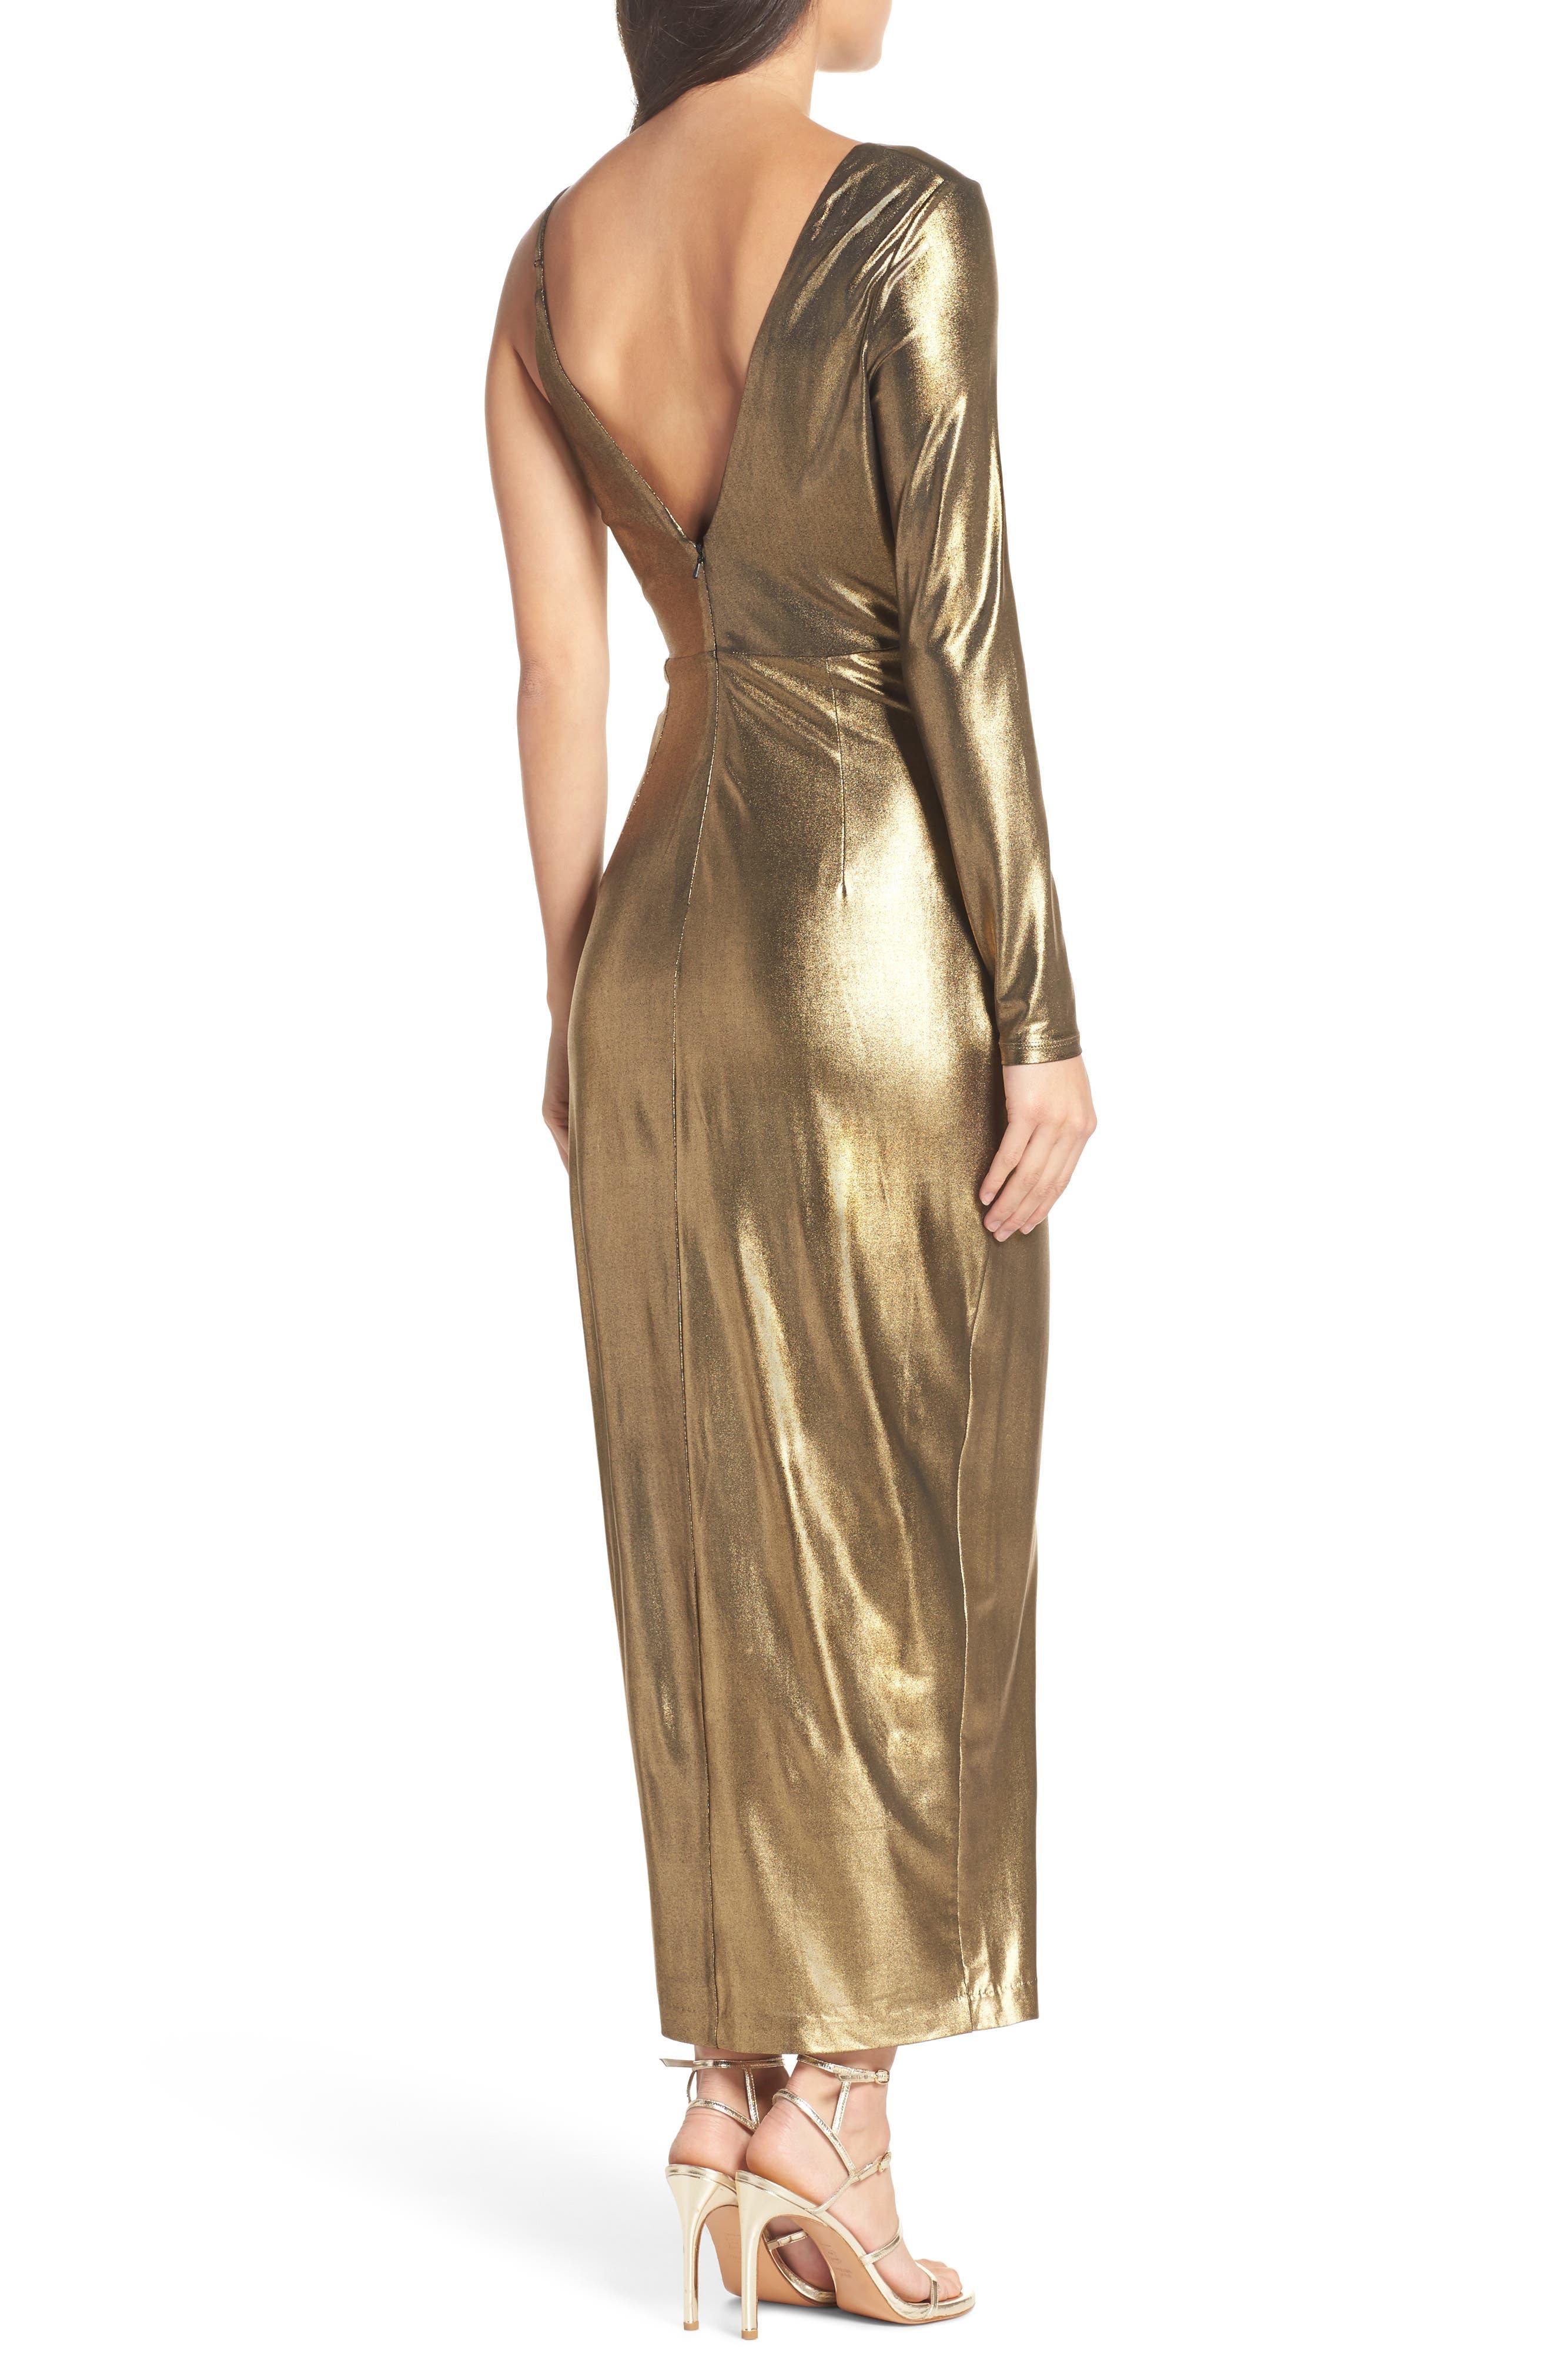 Aurel Metallic Dress,                             Alternate thumbnail 2, color,                             Golden